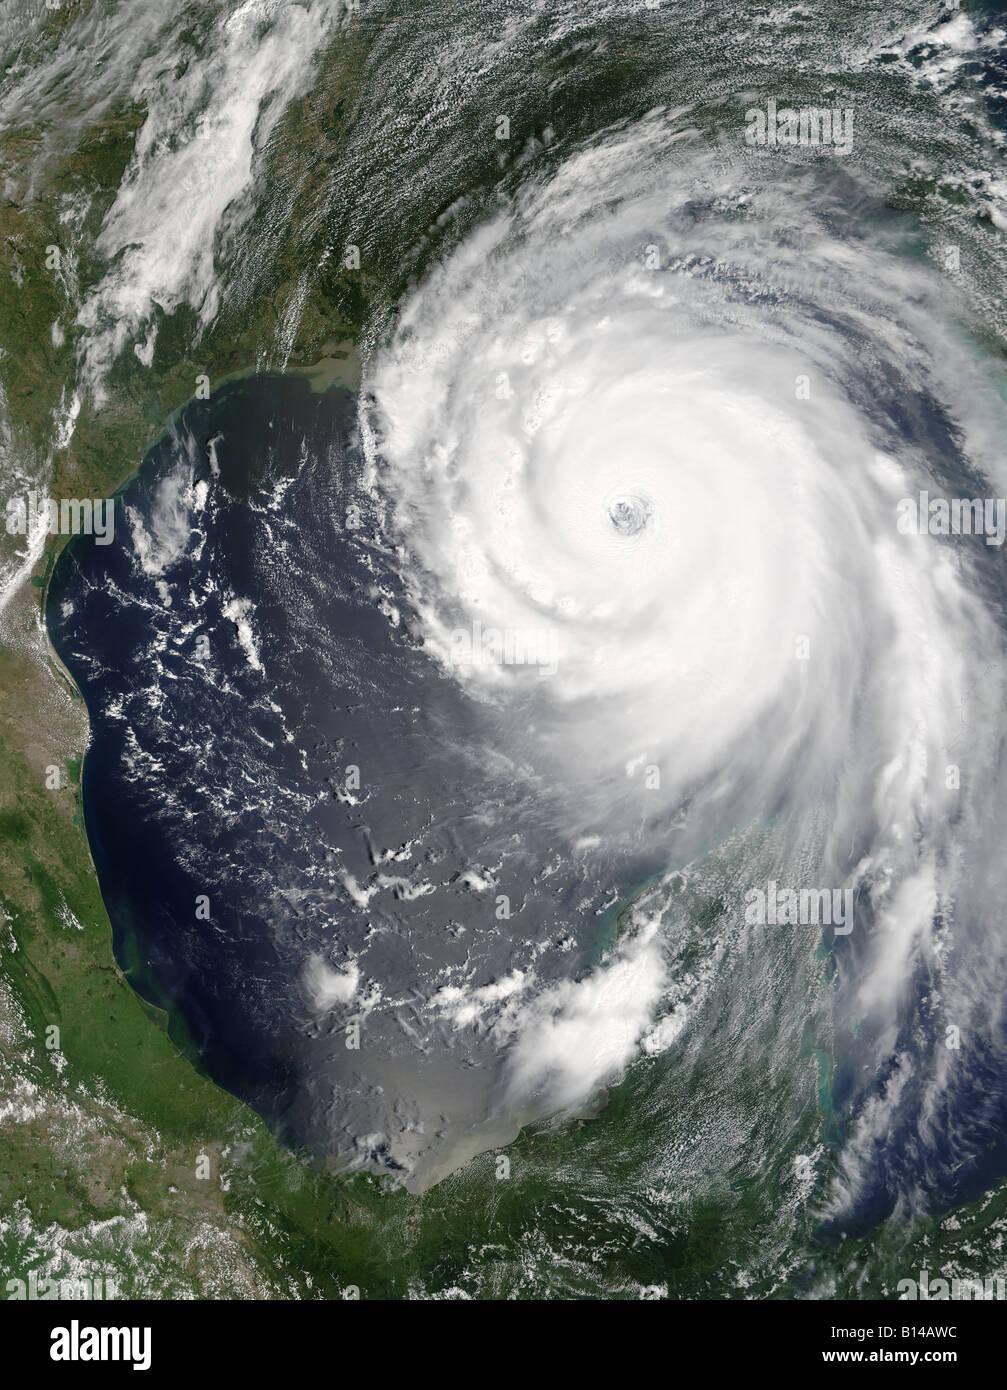 Hurrikan Katrina 28. August 2005 NASA-Foto Stockbild